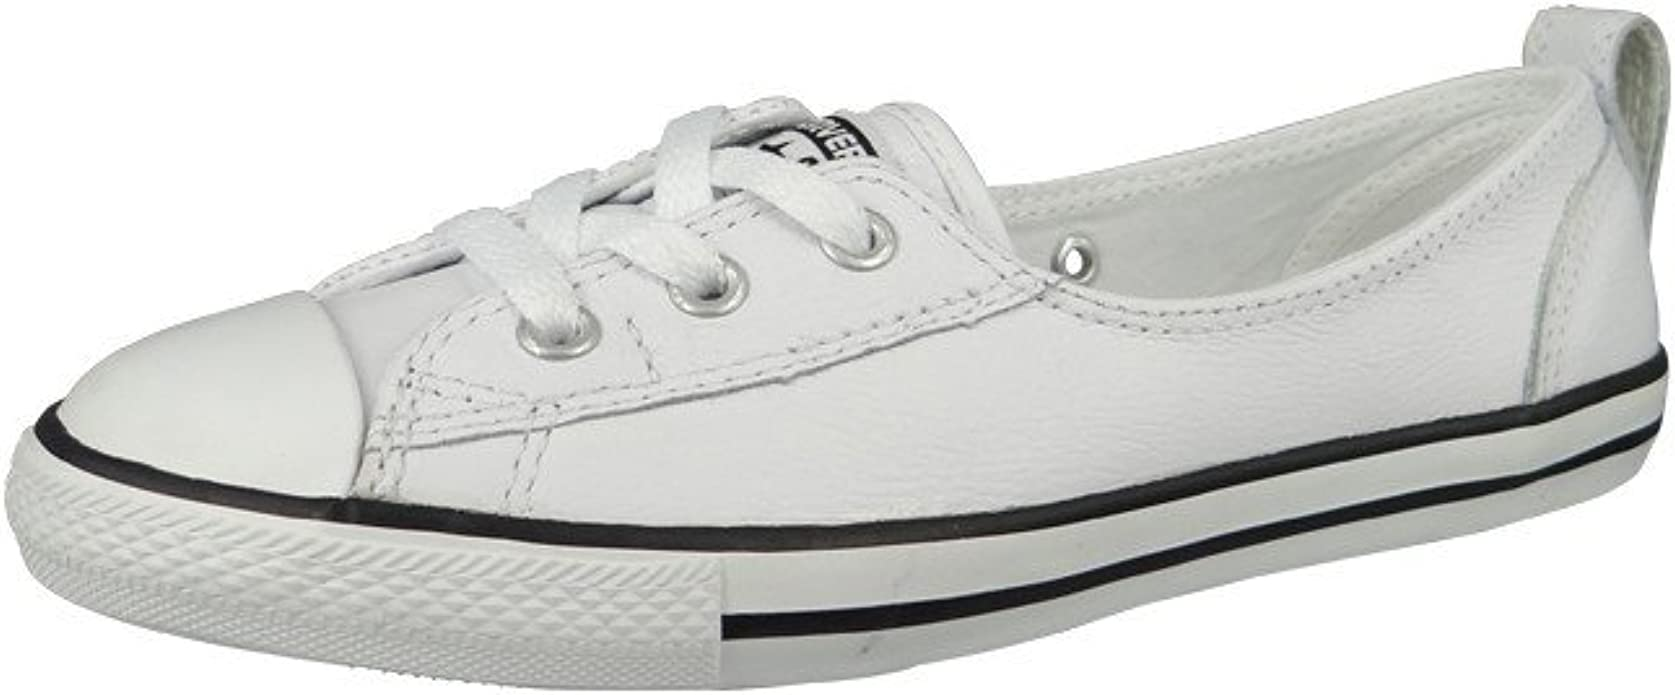 Converse Chucks All Star Dainty